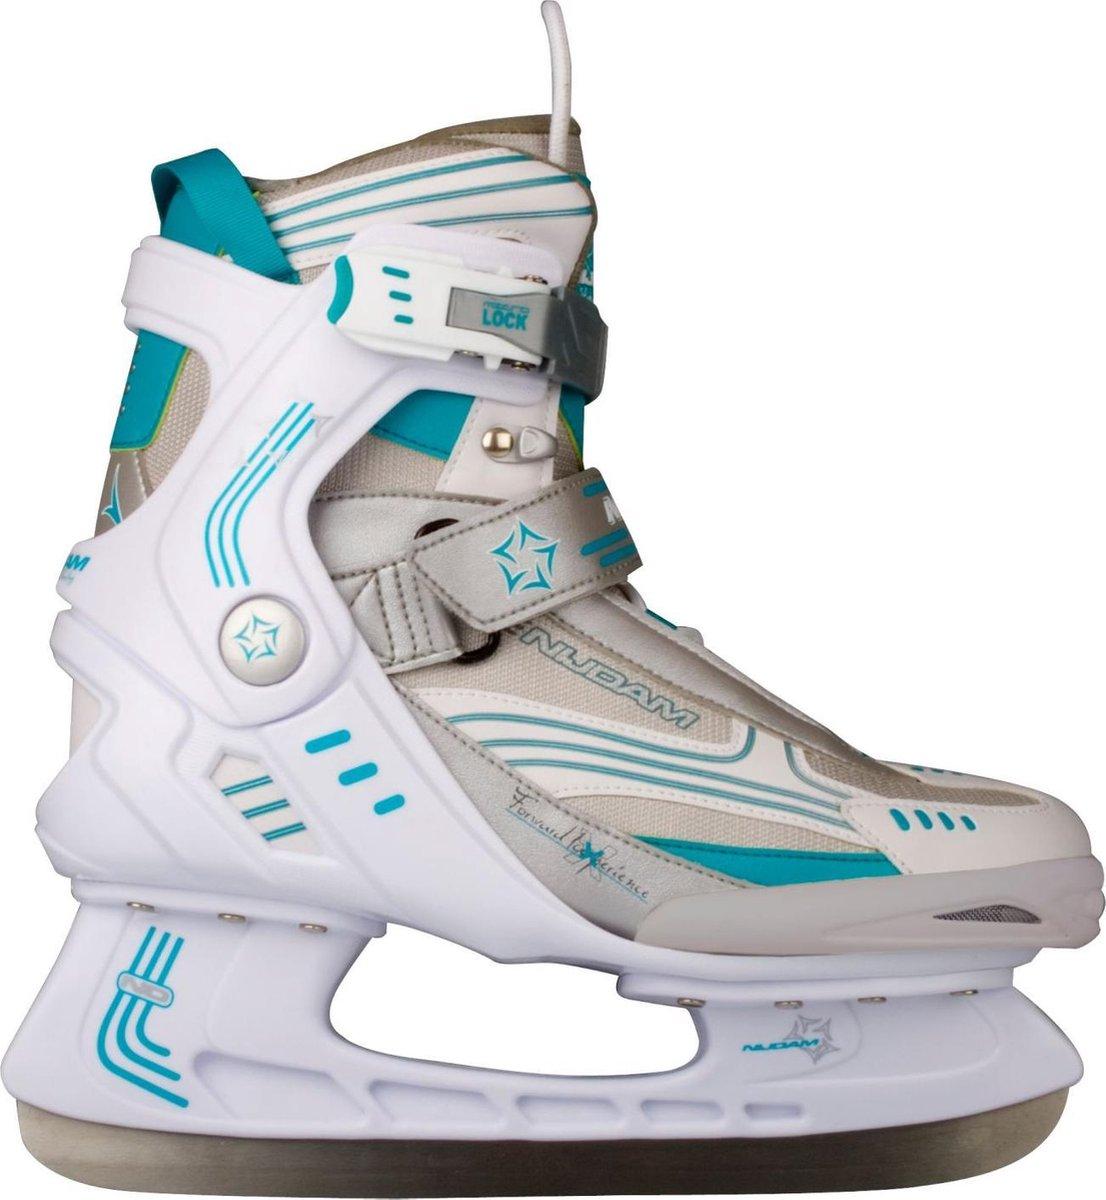 Nijdam 3353 Ijshockeyschaats - Semi-Softboot - Wit/Turquoise - Maat 40